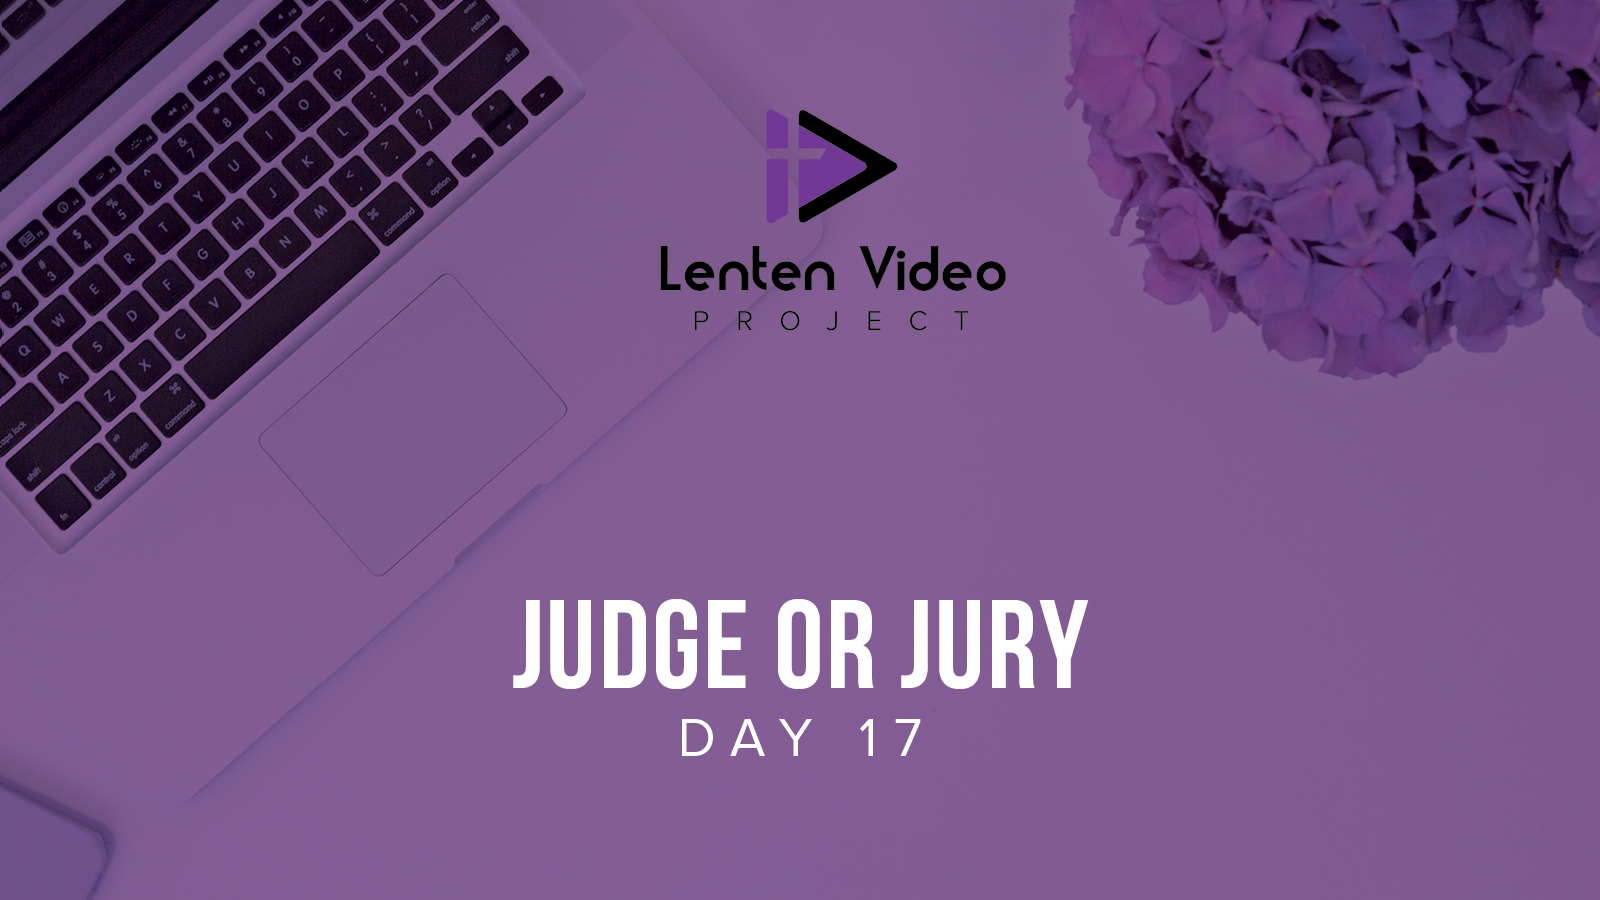 Judge or Jury